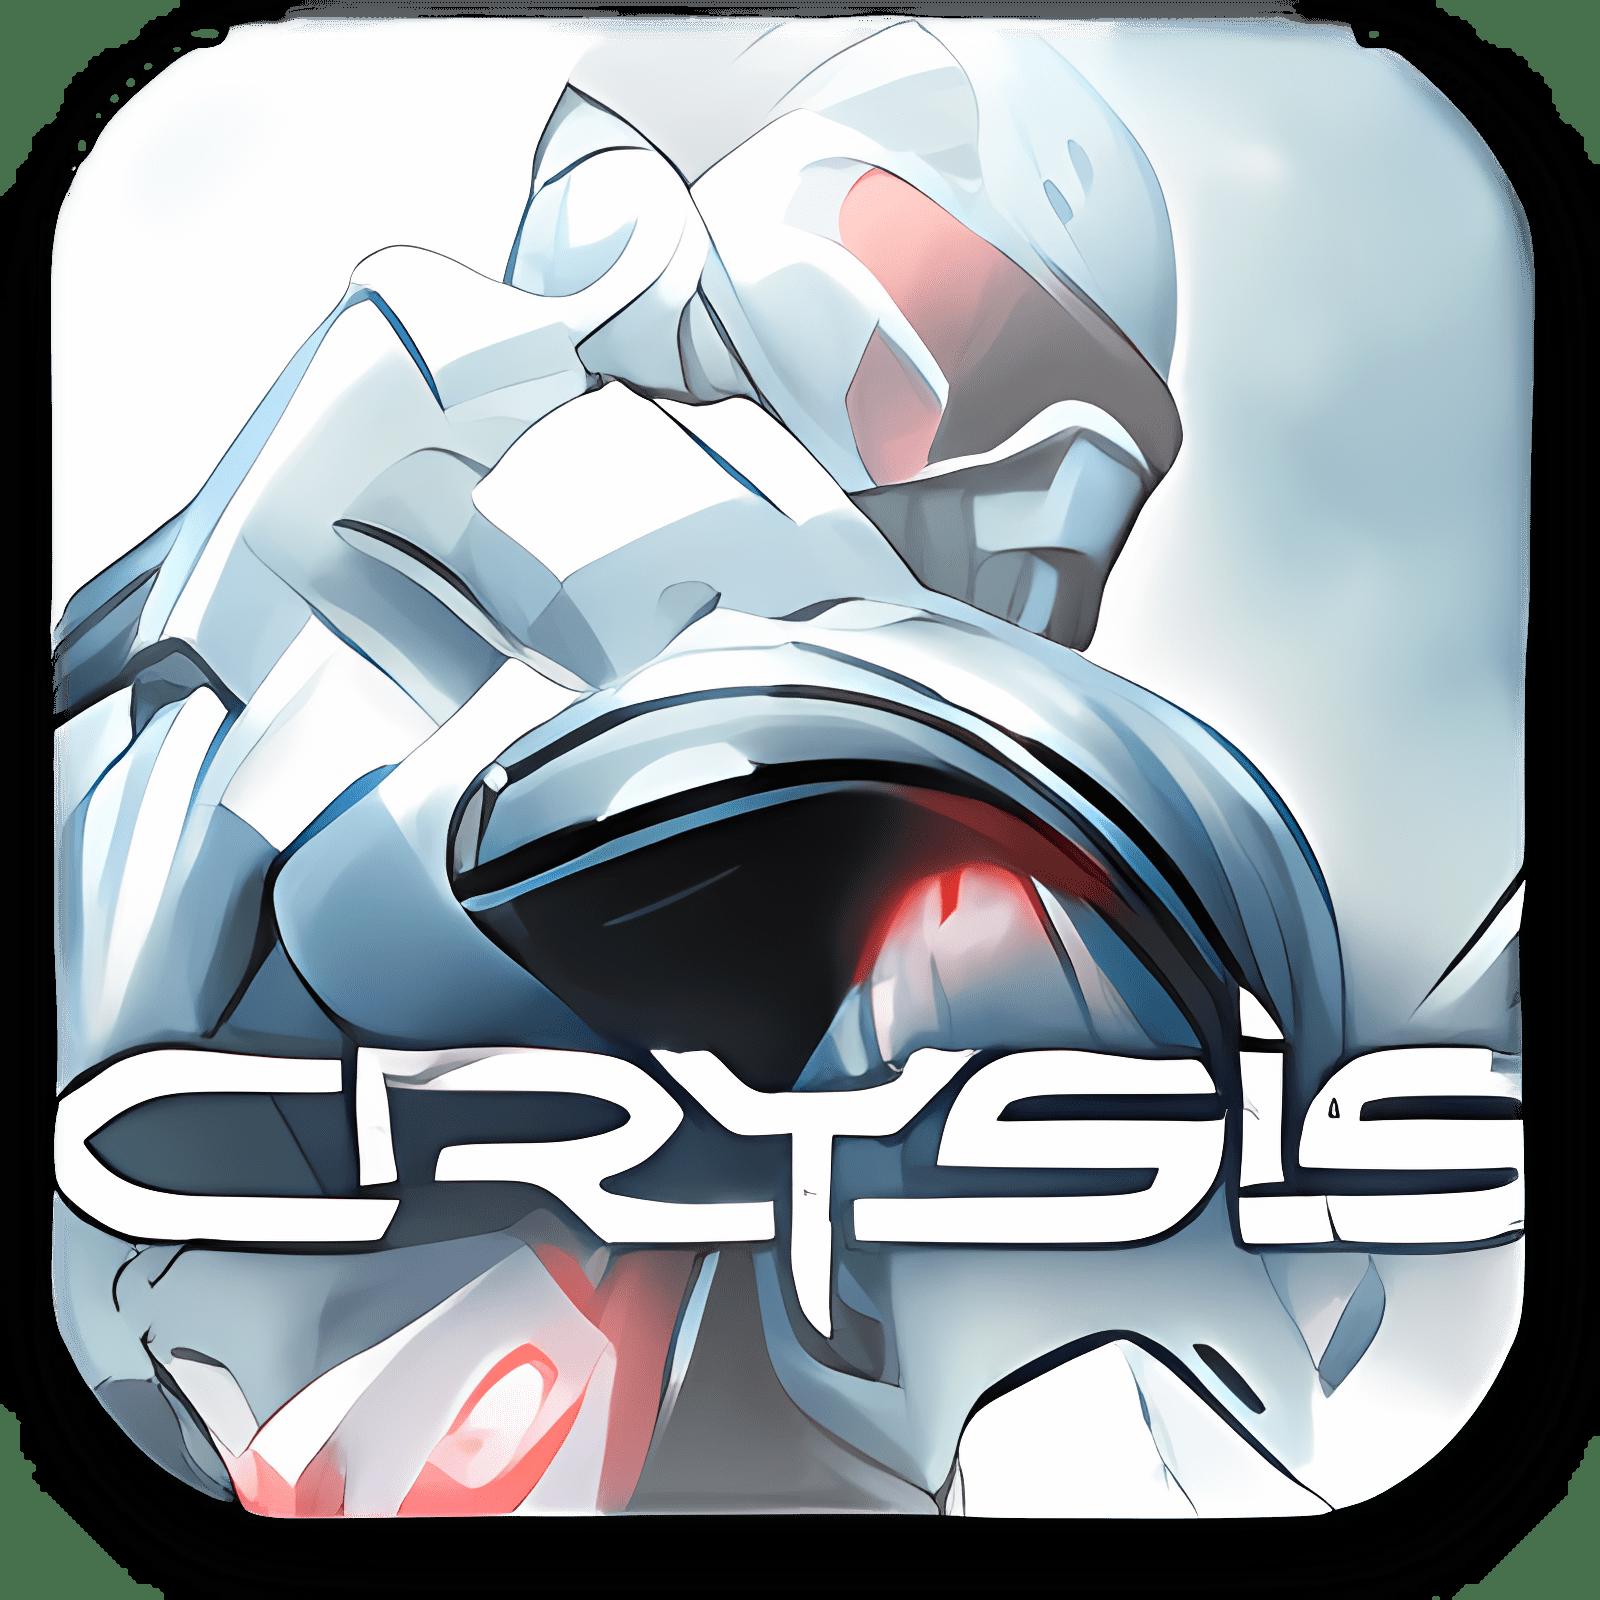 Crysis - Patch 2